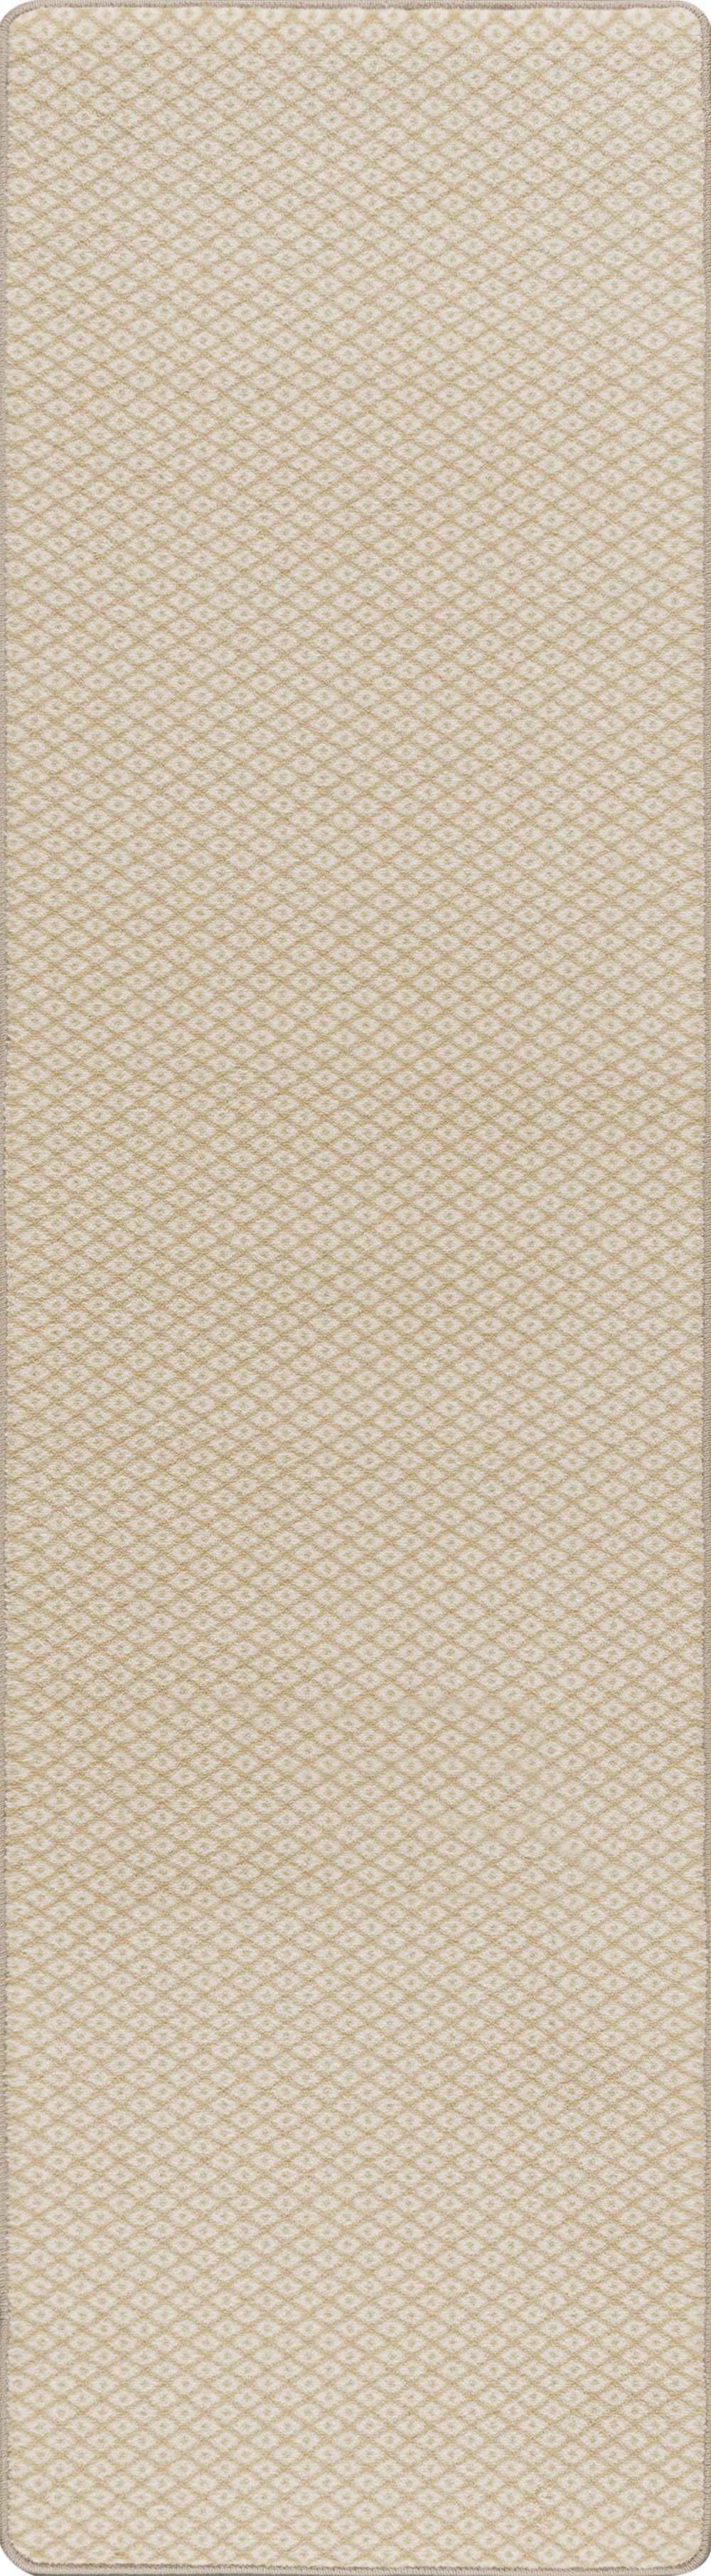 Tinsman Arabian Sand Area Rug Rug Size: Runner 2'1